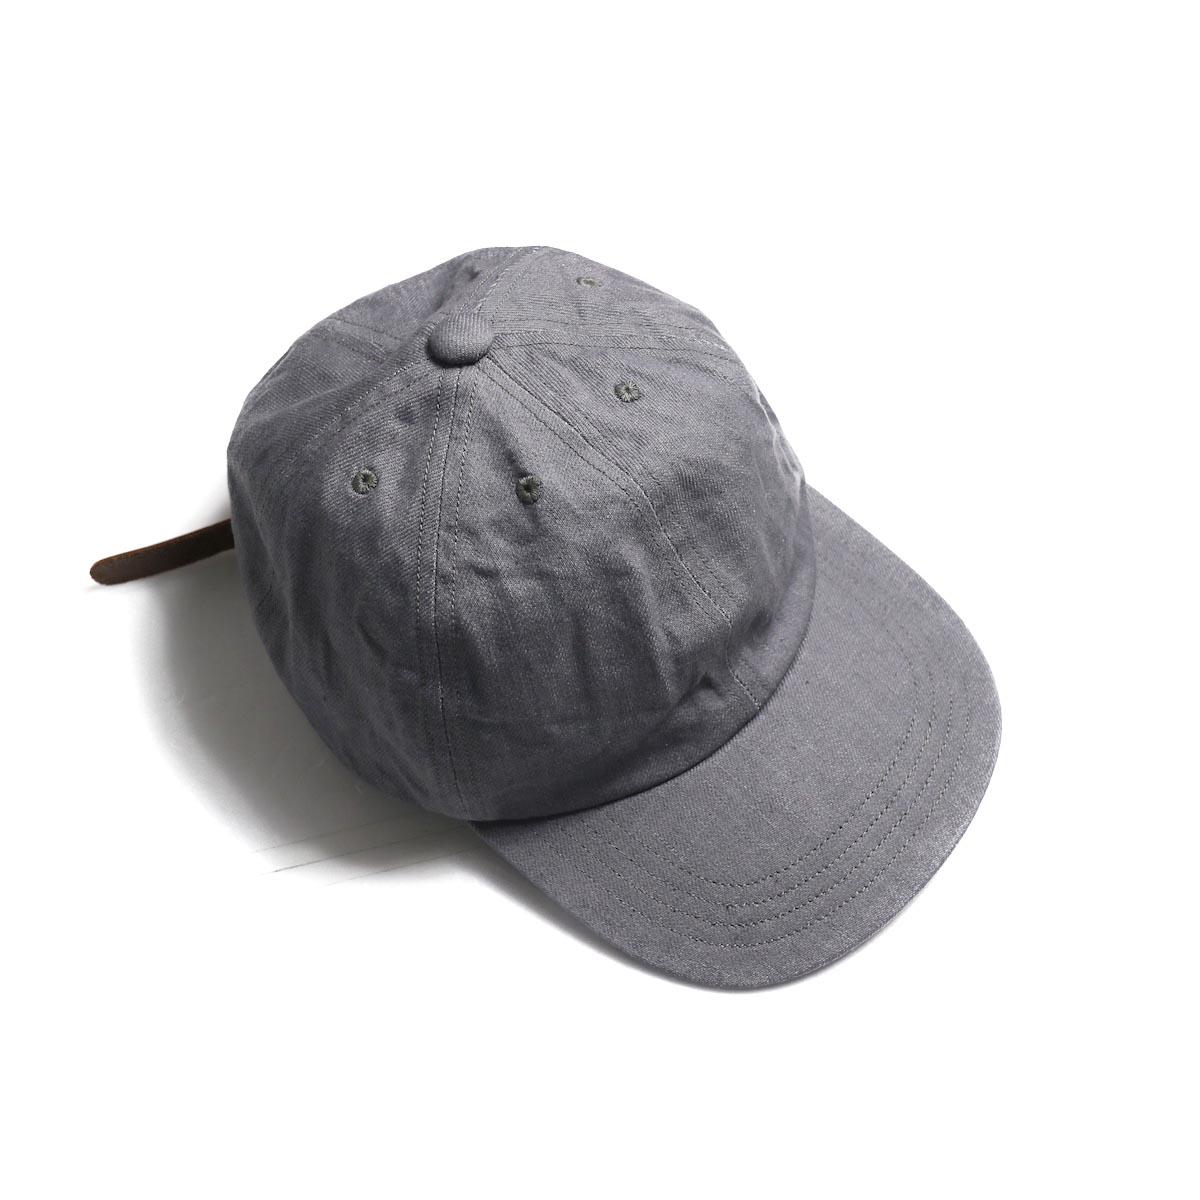 COMESANDGOES / Denim Cap (NO.14519) Light Gray